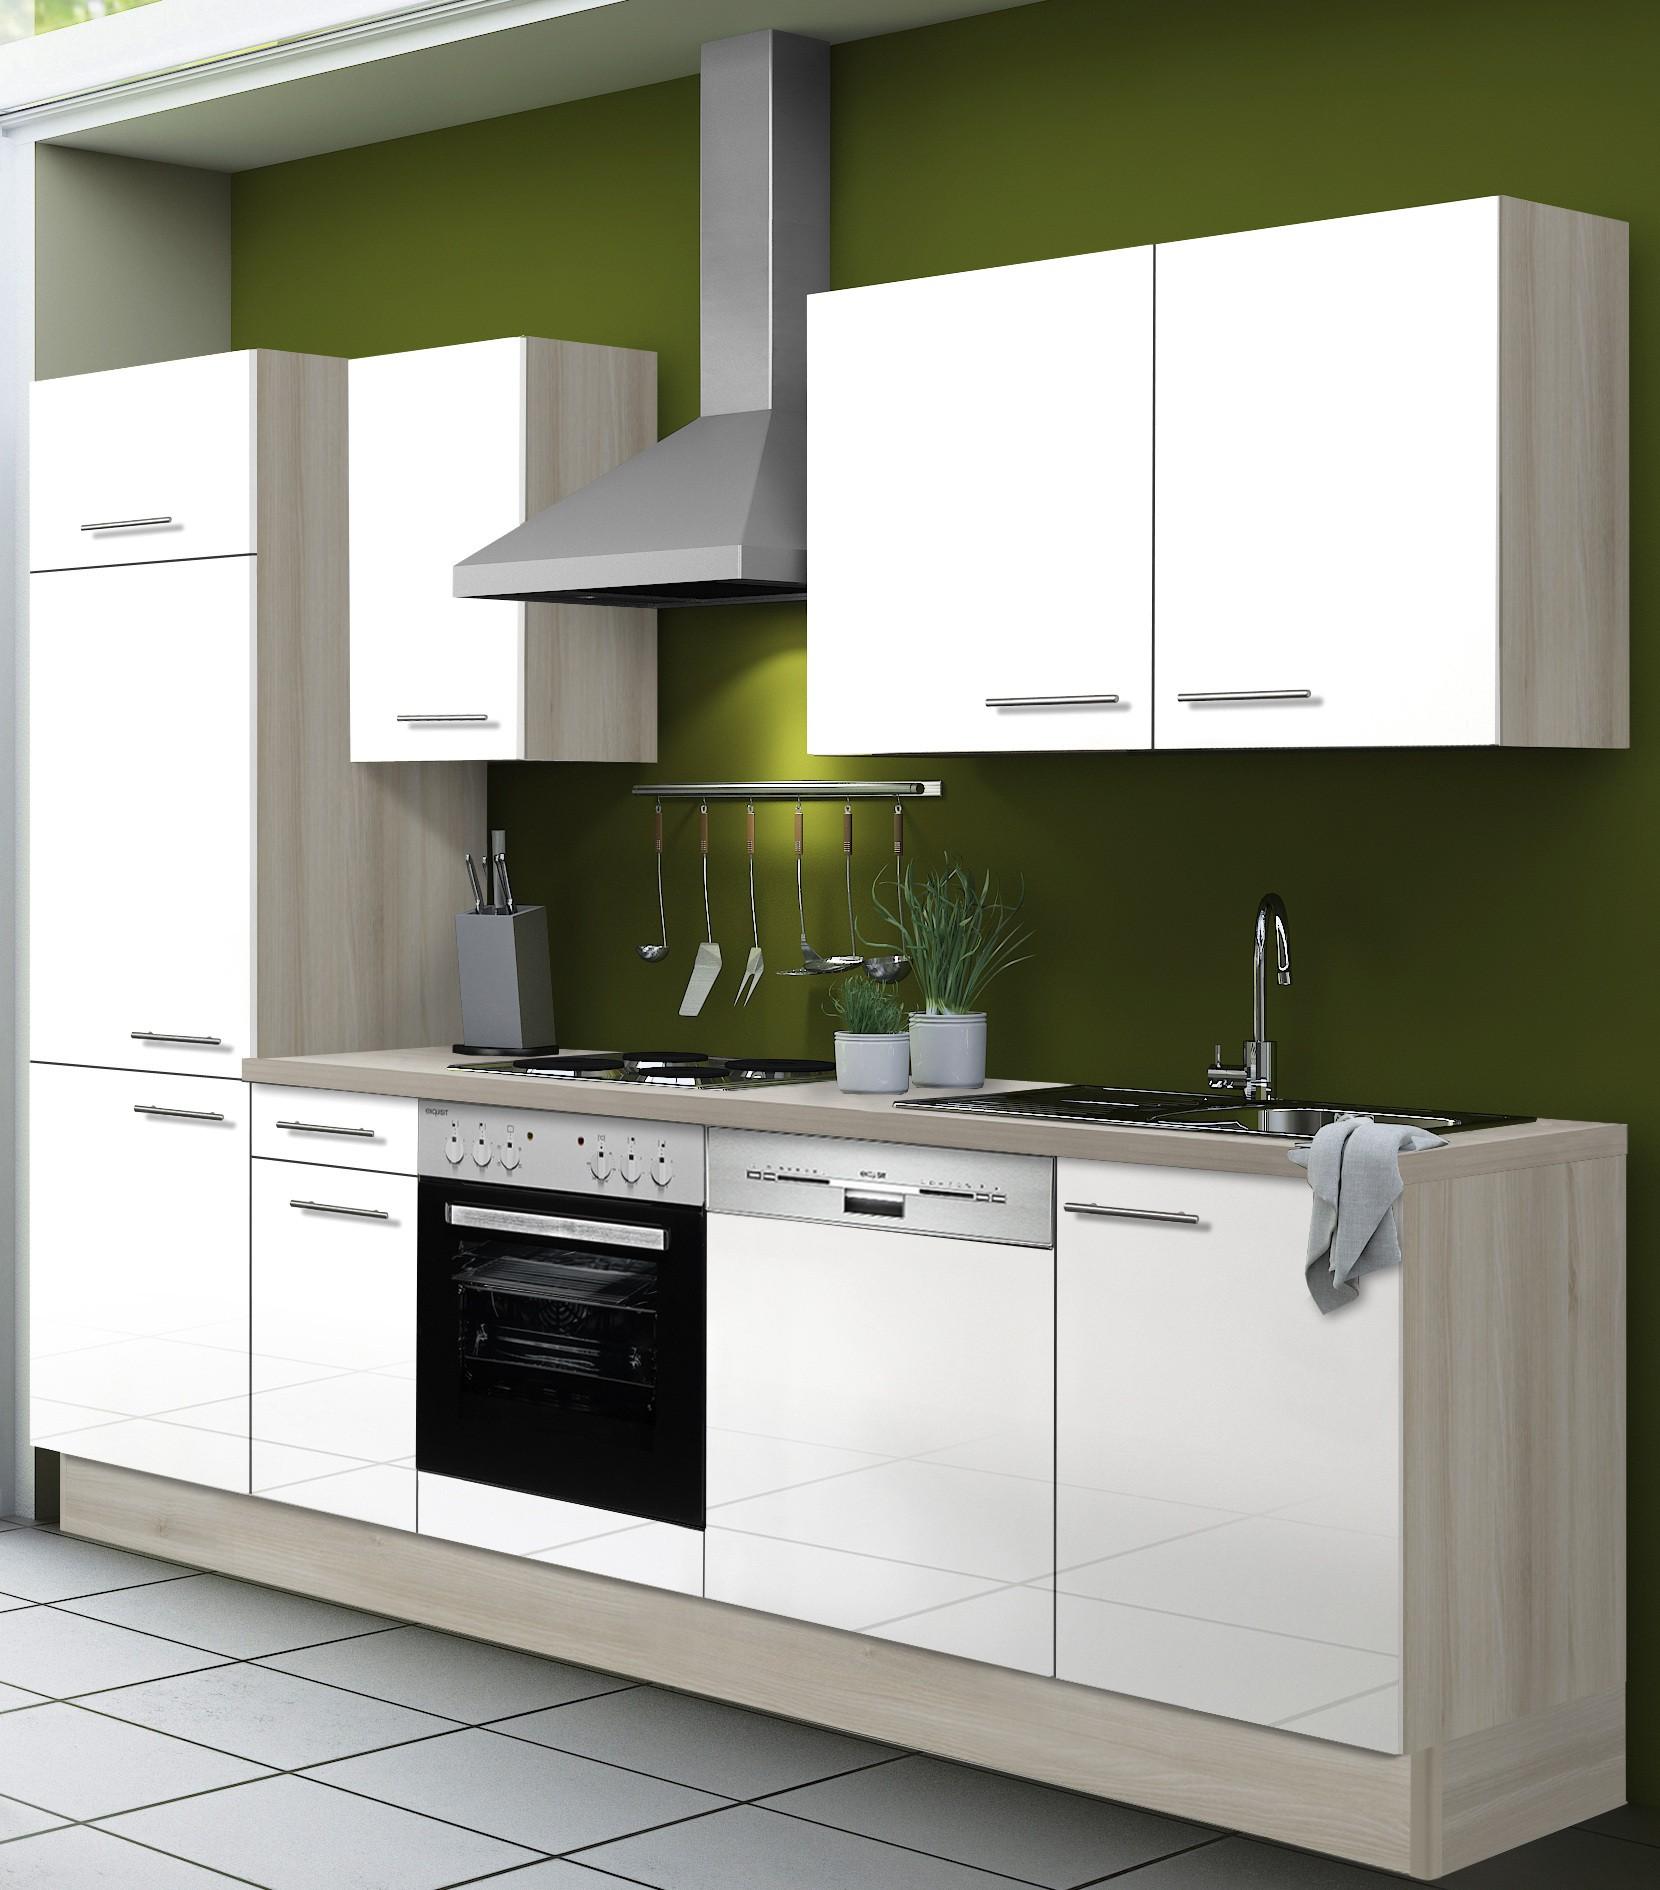 k chenzeile leon vario 1 k che mit e ger ten breite. Black Bedroom Furniture Sets. Home Design Ideas